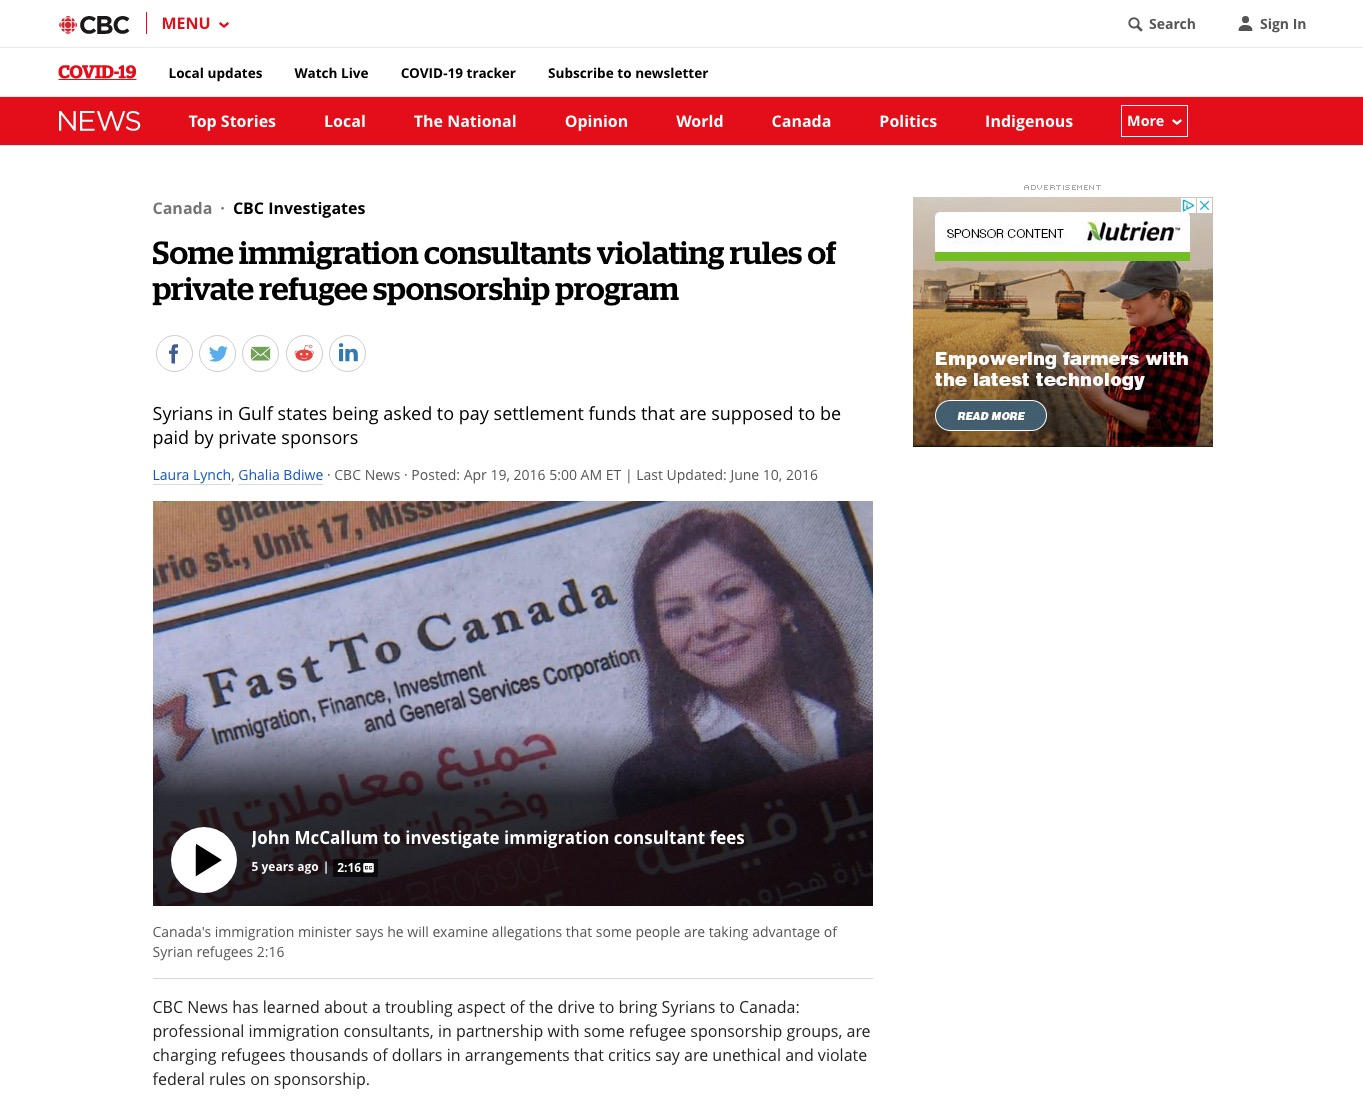 Jacqueline Swaisland – Immigration consultants violating rules of refugee sponsorship program